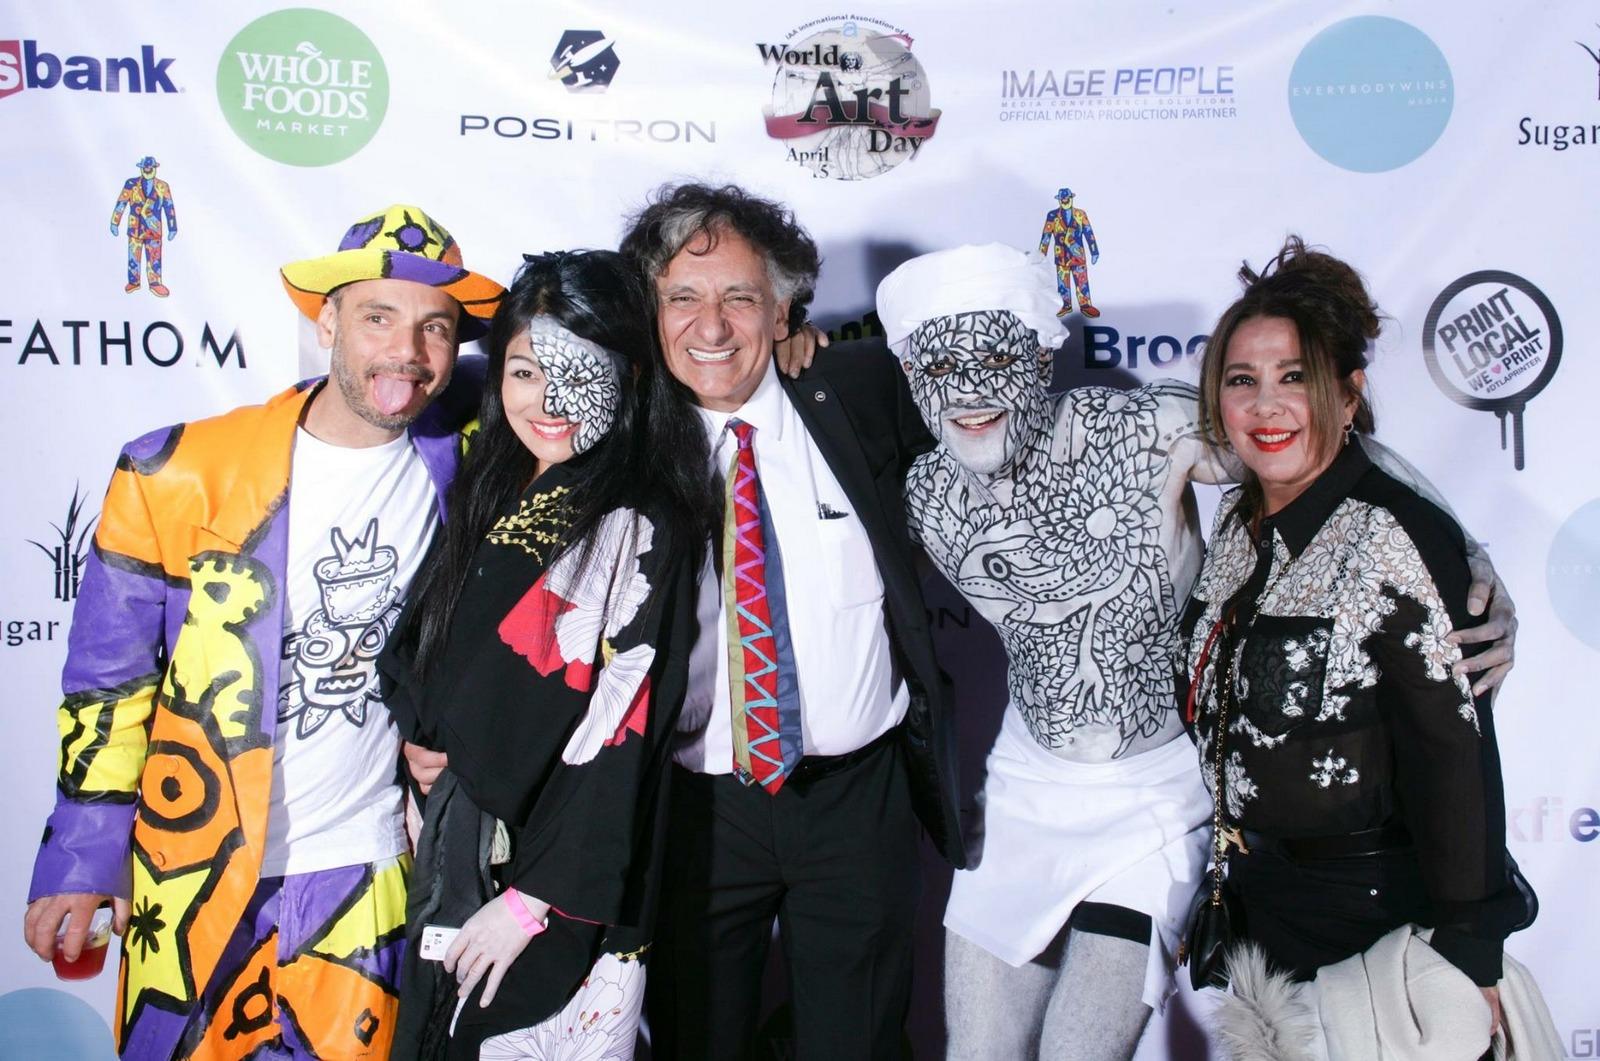 World Art Day Gala (2016)  Los Angeles, CA